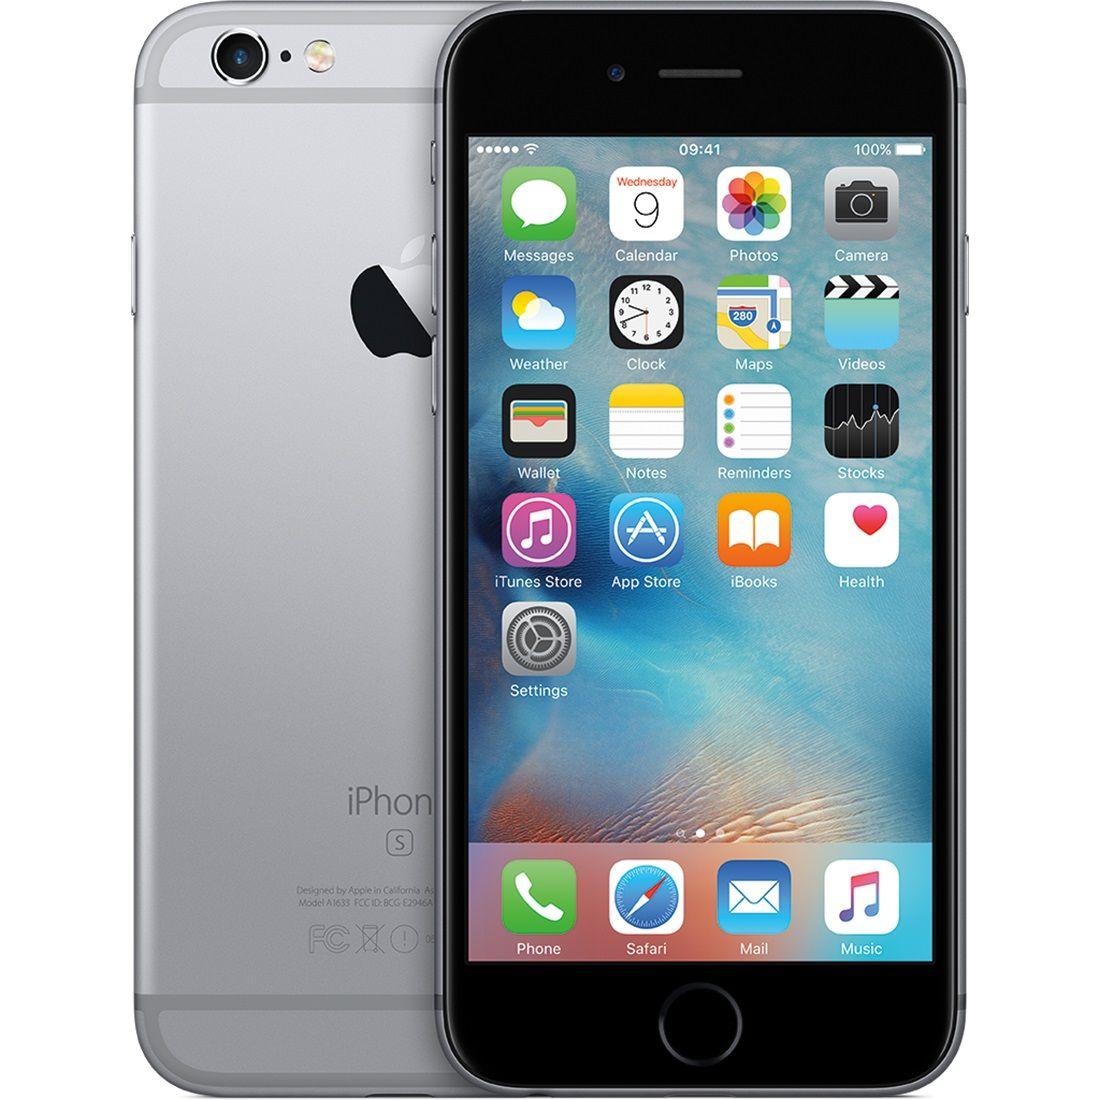 iPhone 6s mai rapid 10 secunde